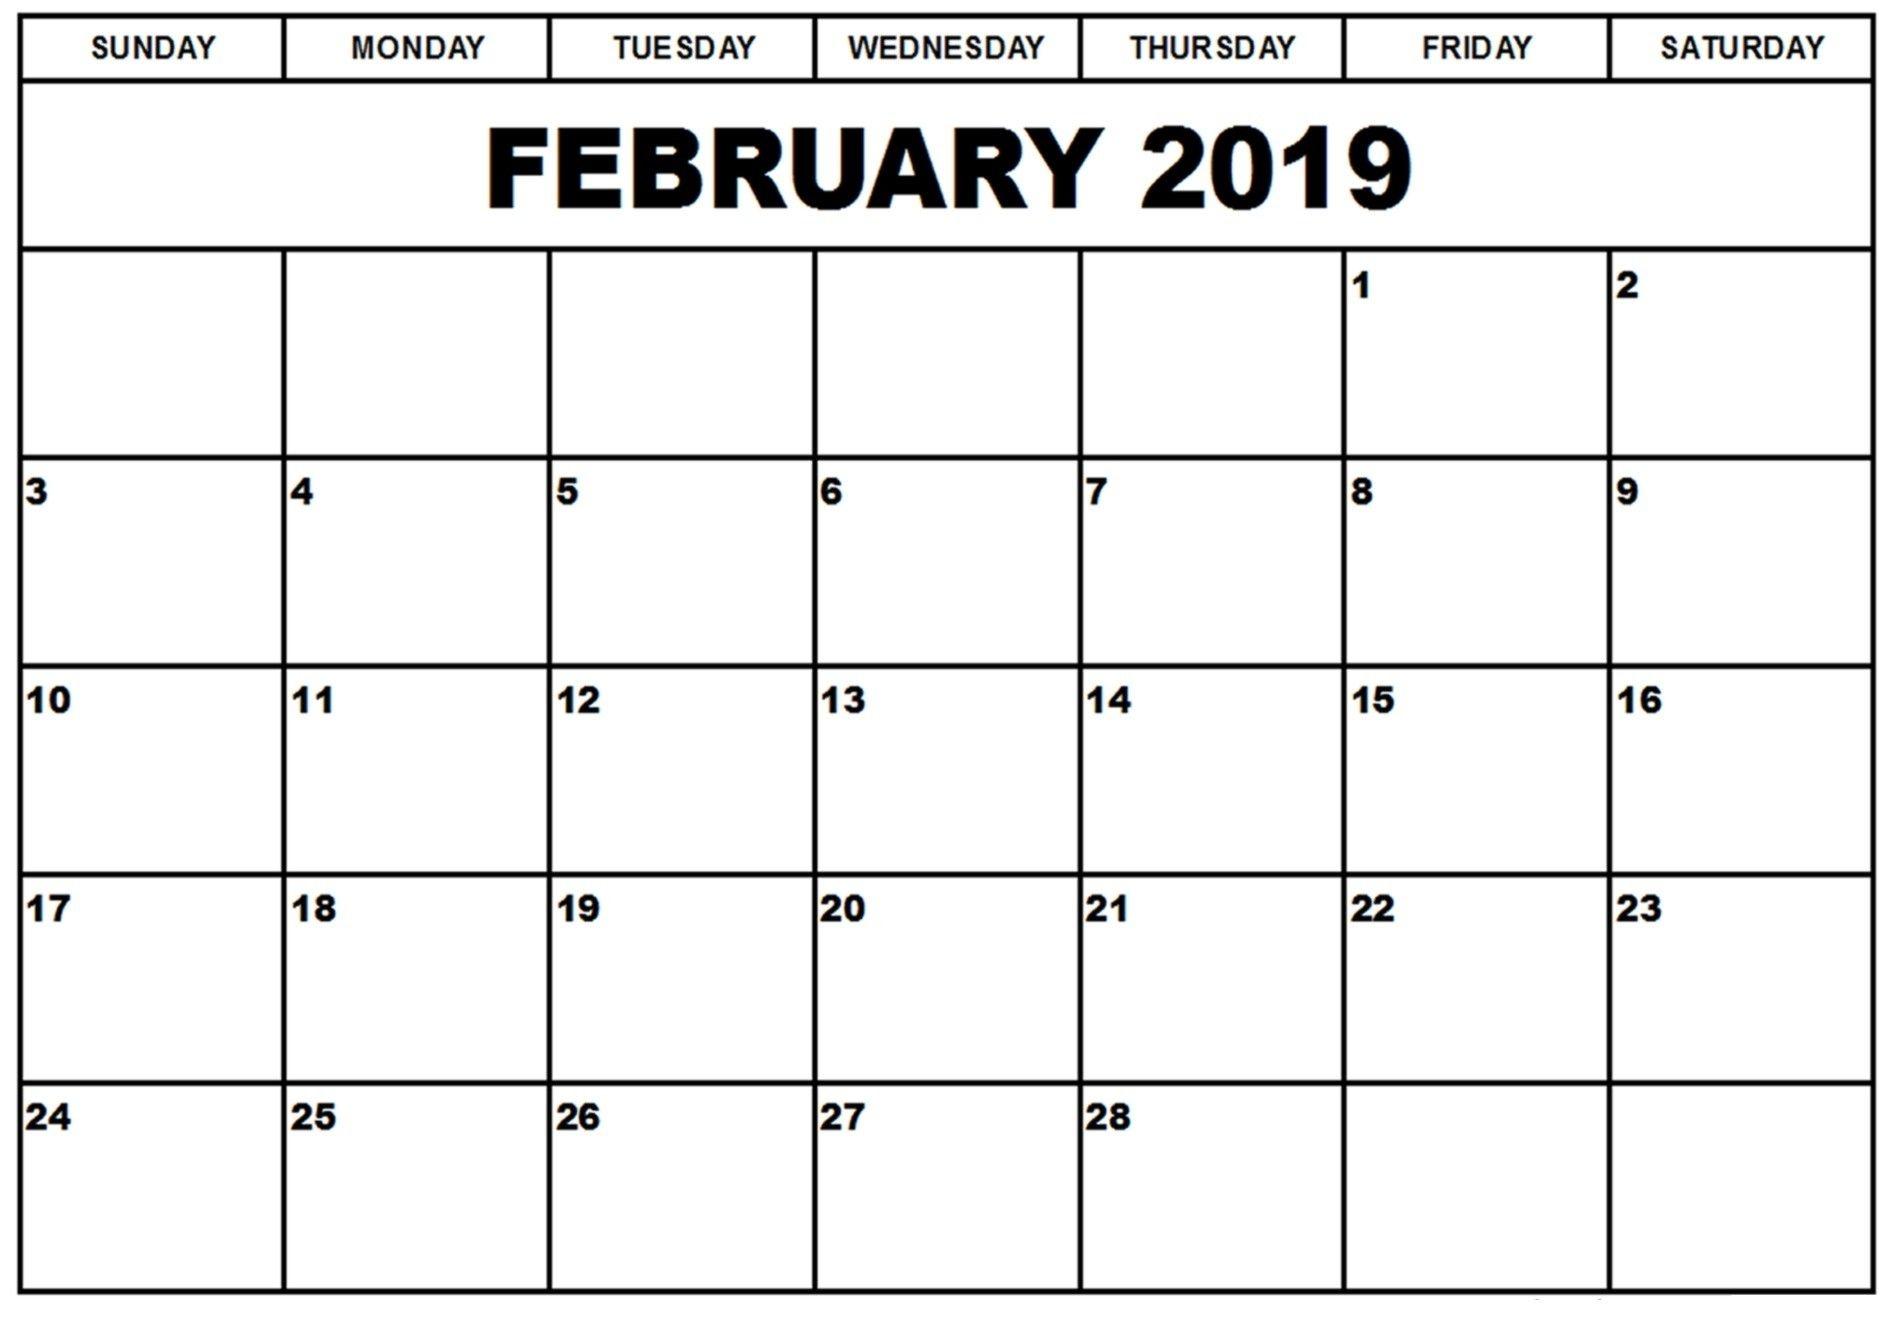 Calendar February 2019 Template